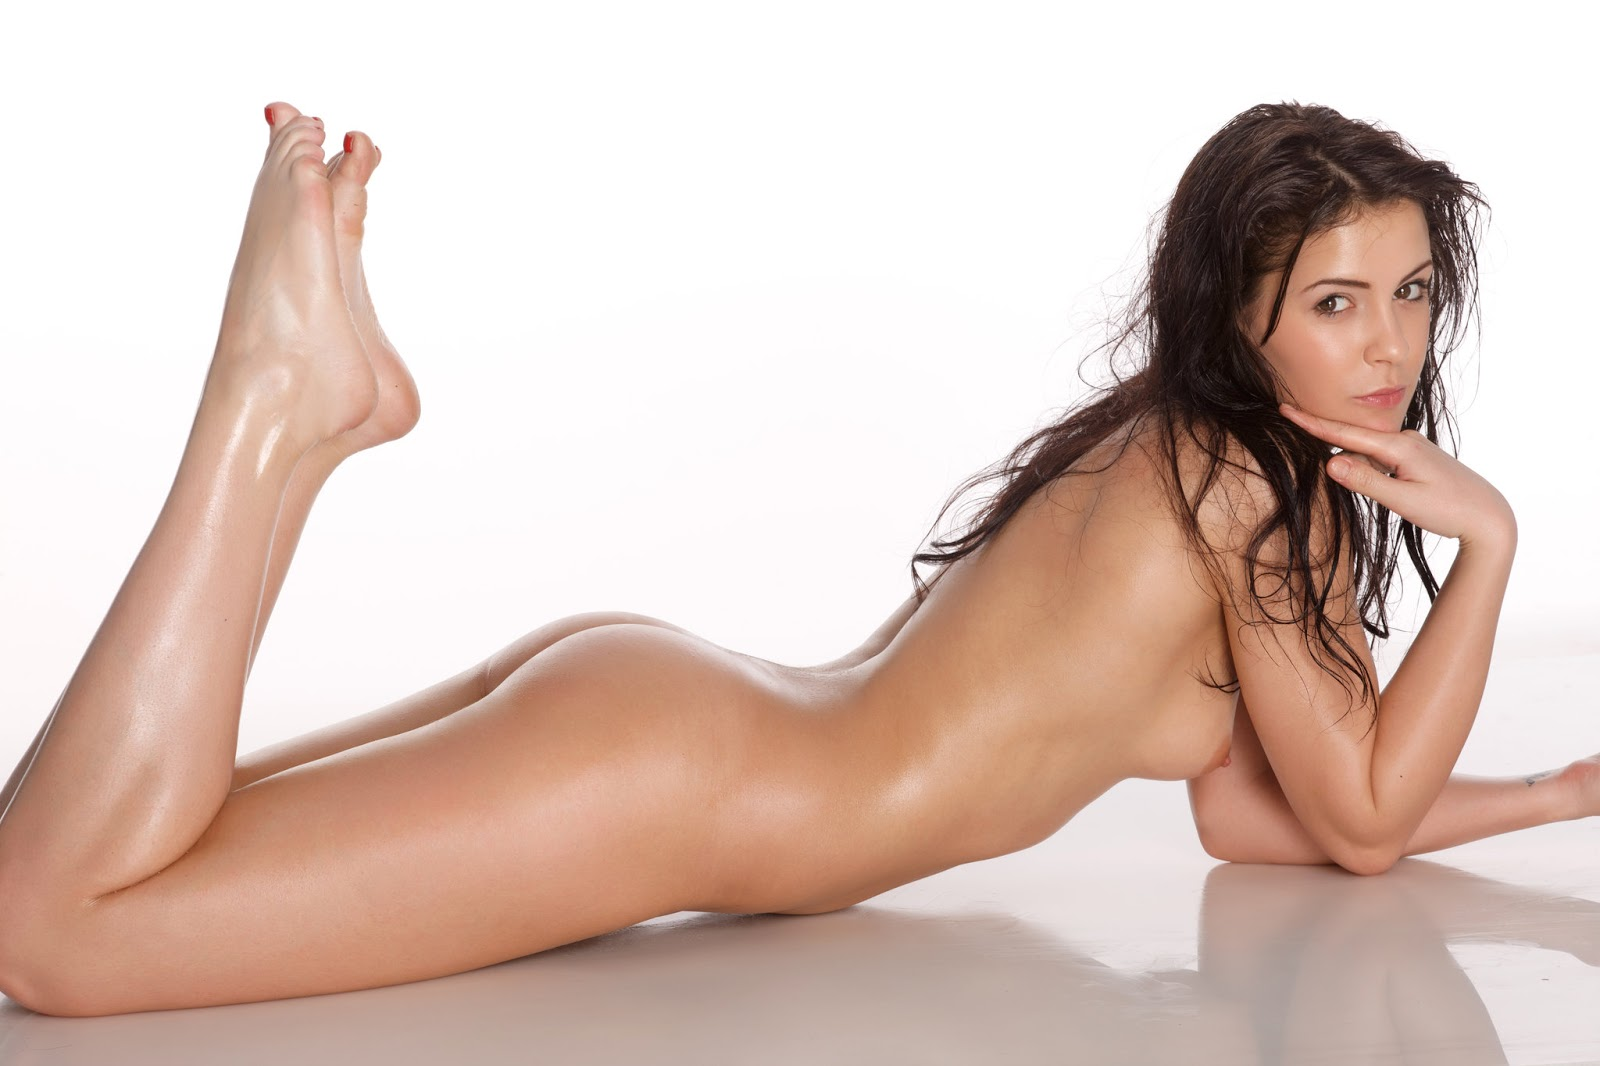 Neta alchamister nude